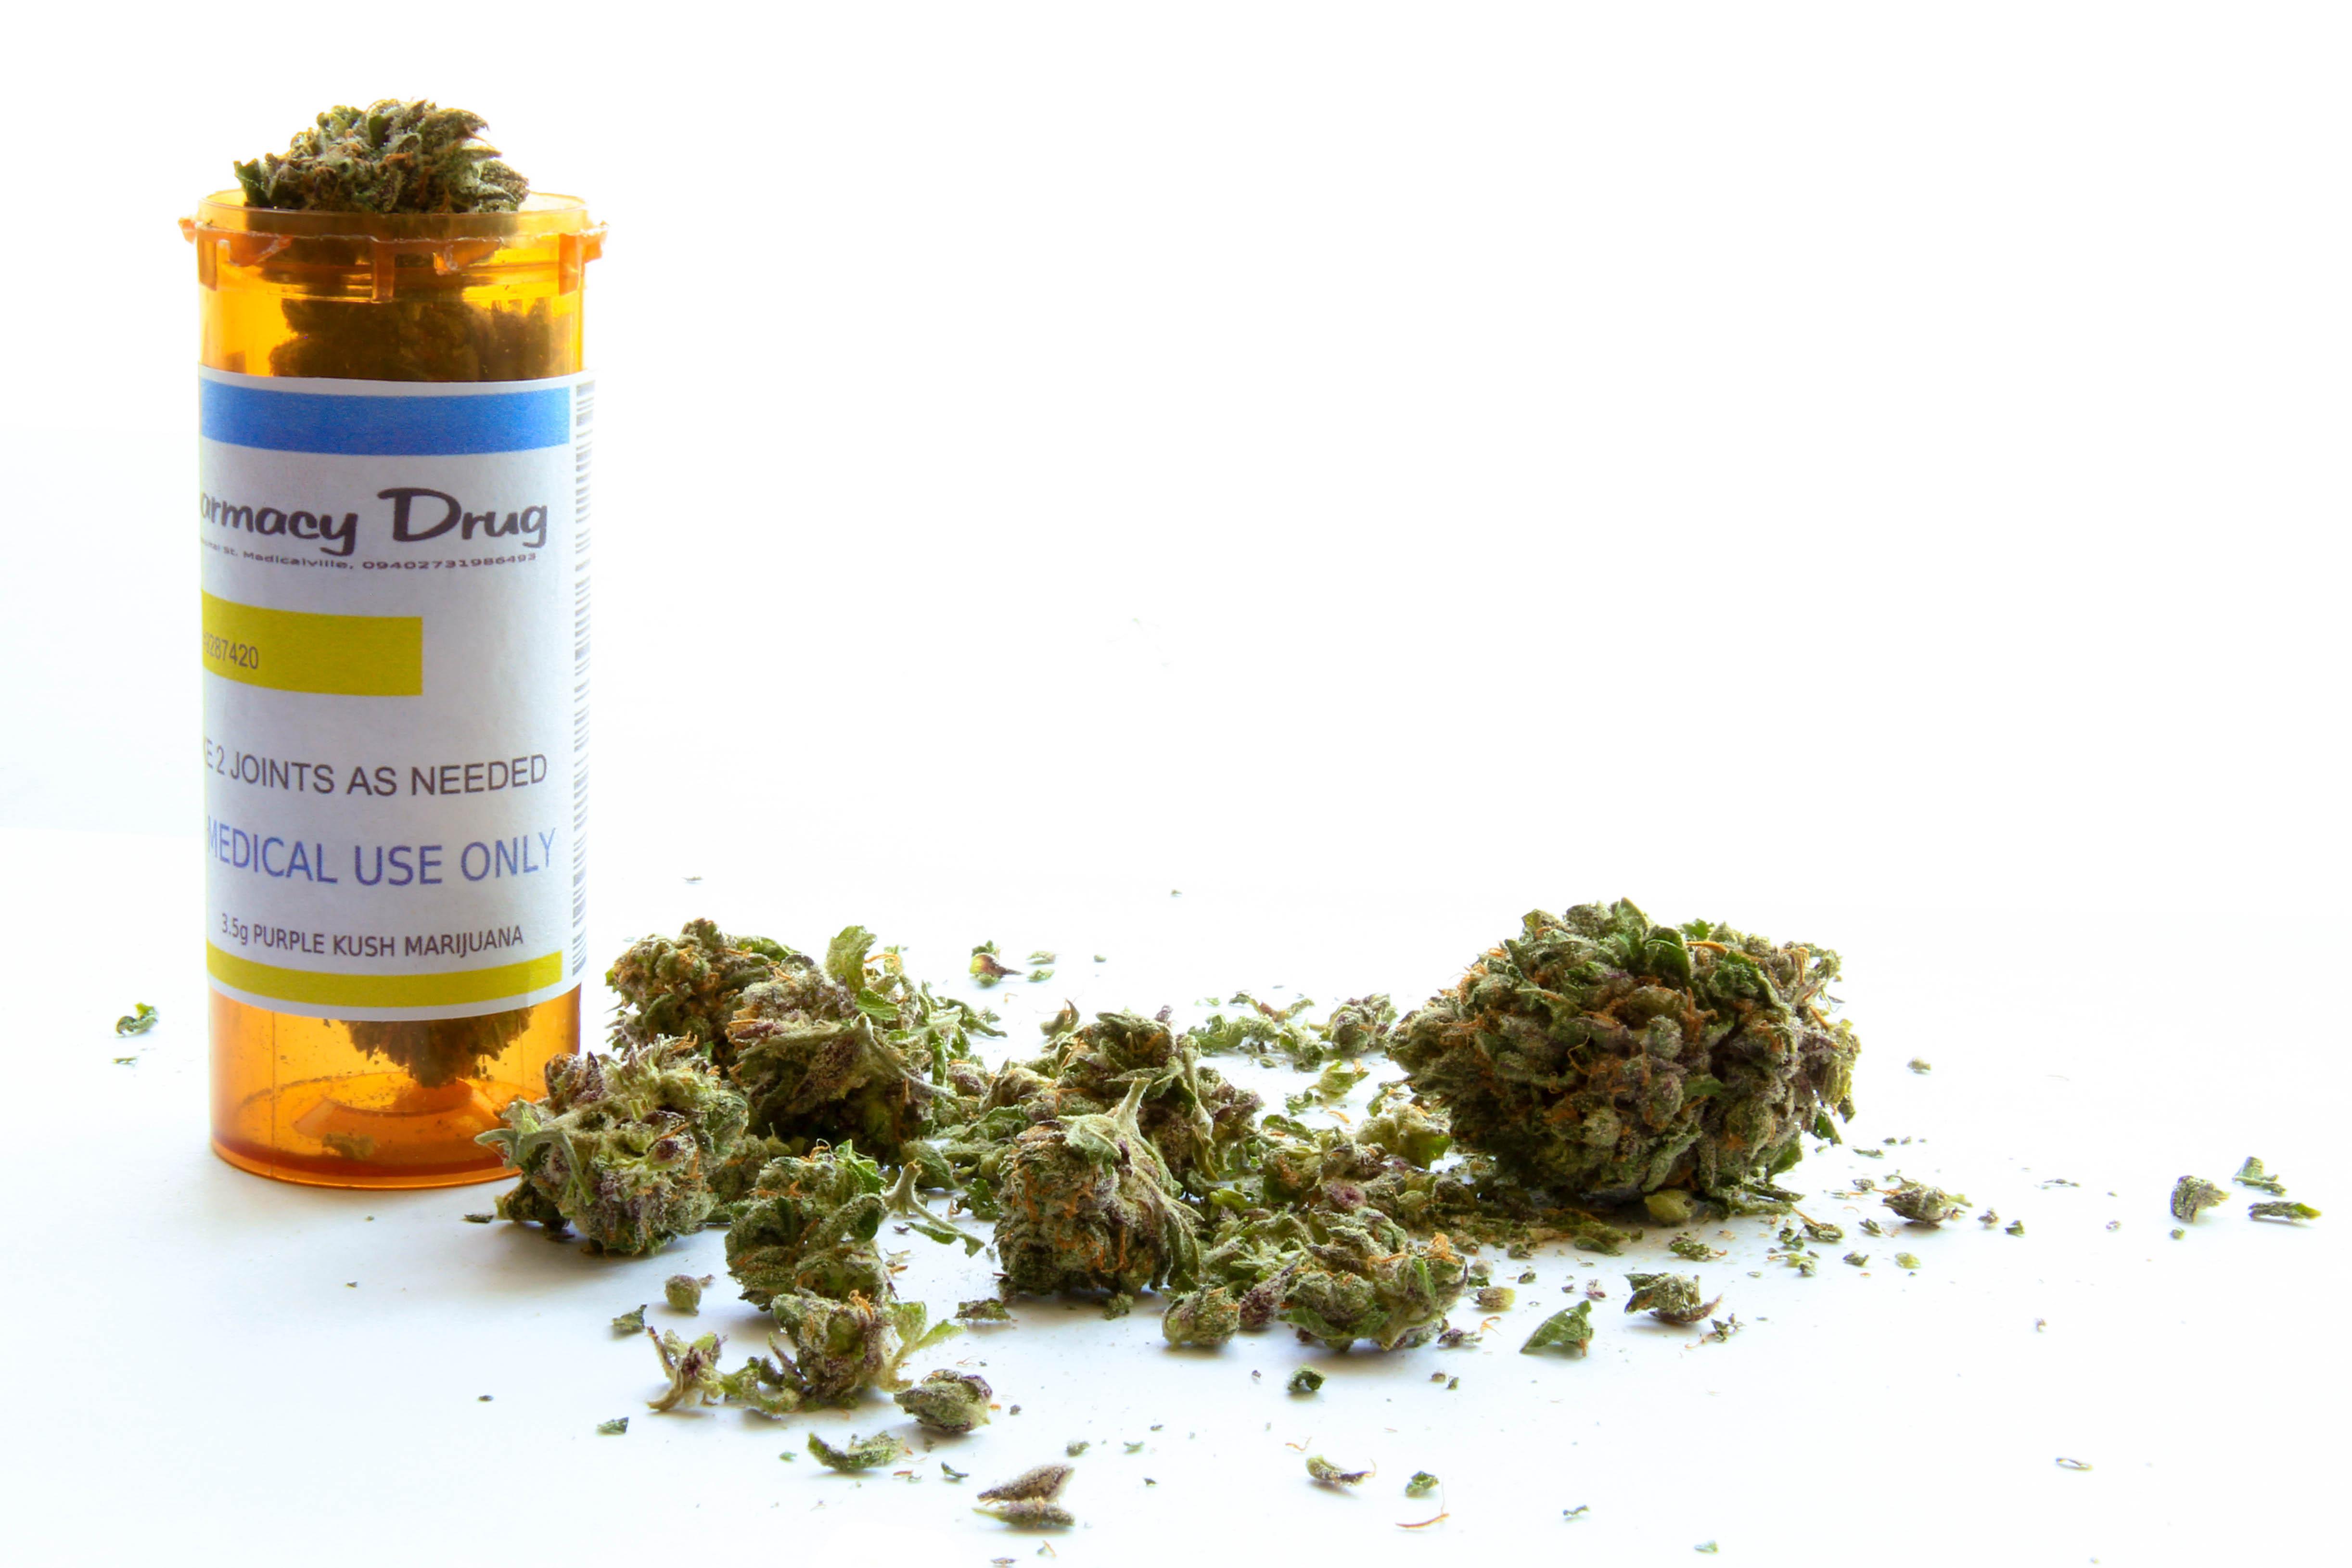 Marijuana may have limited medical value. That's okay.